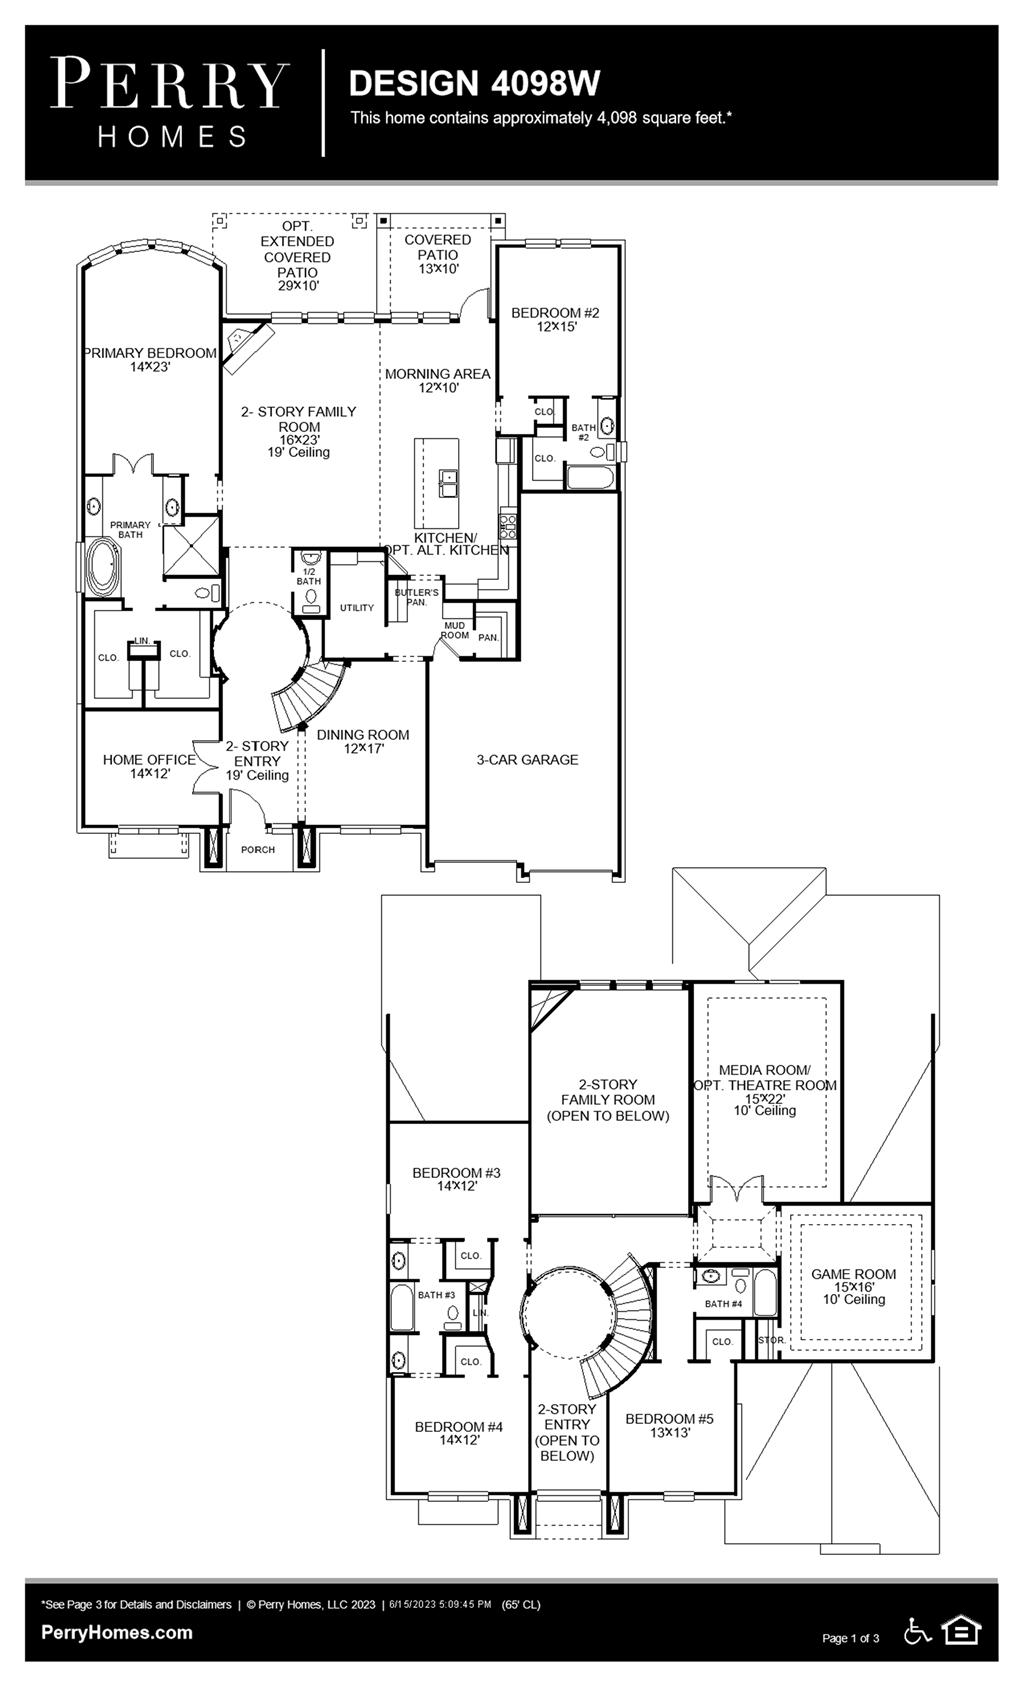 Floor Plan for 4098W